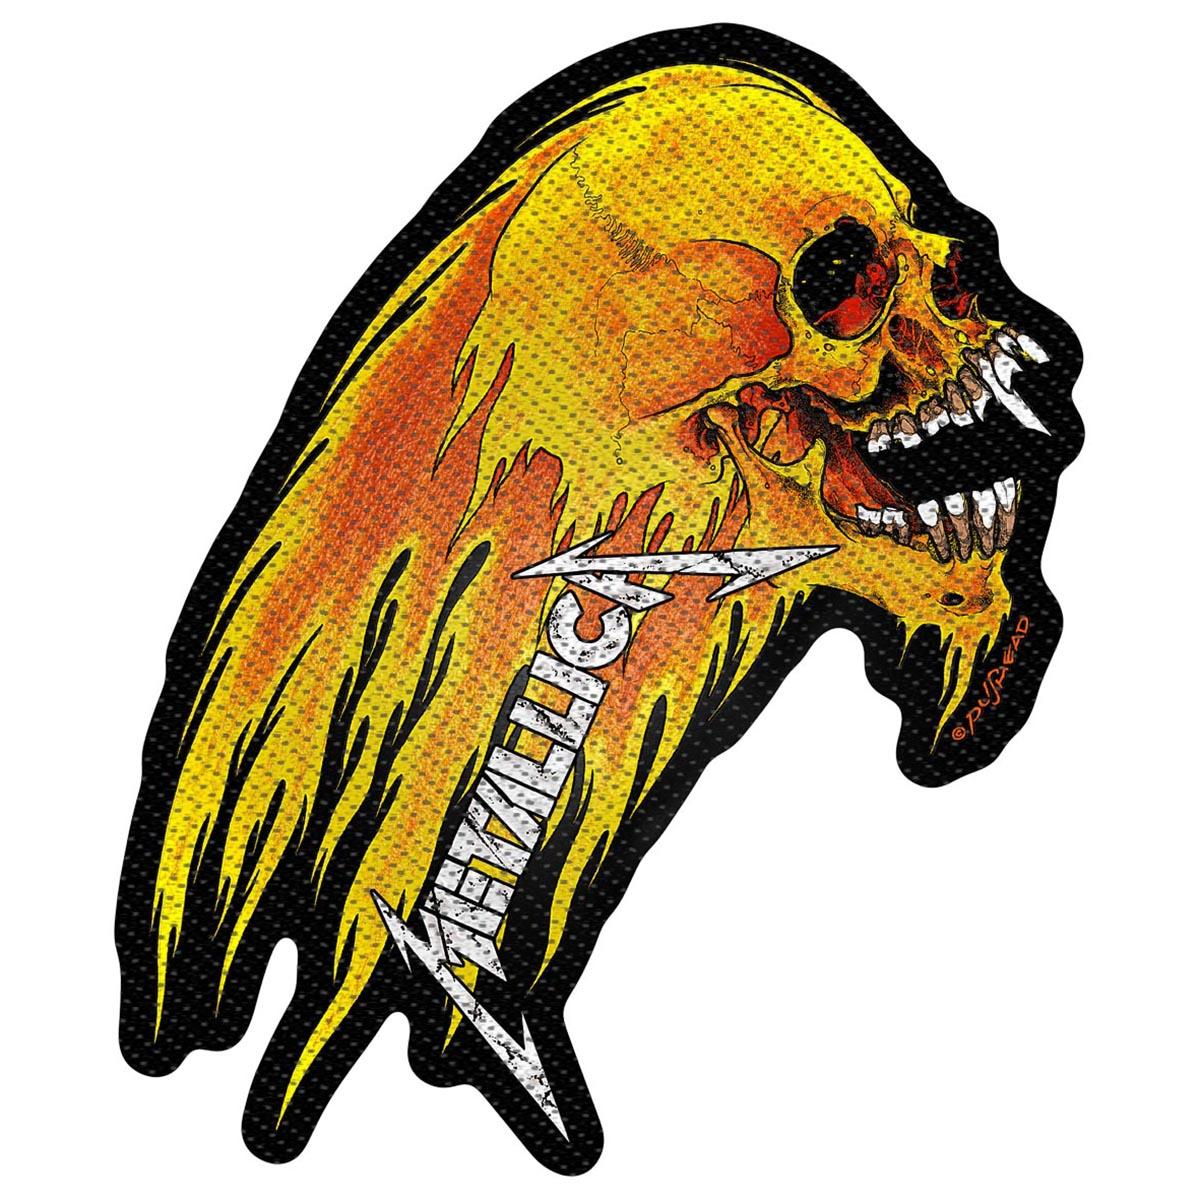 Flaming Skull – Die Cut Woven Patch - Metallica